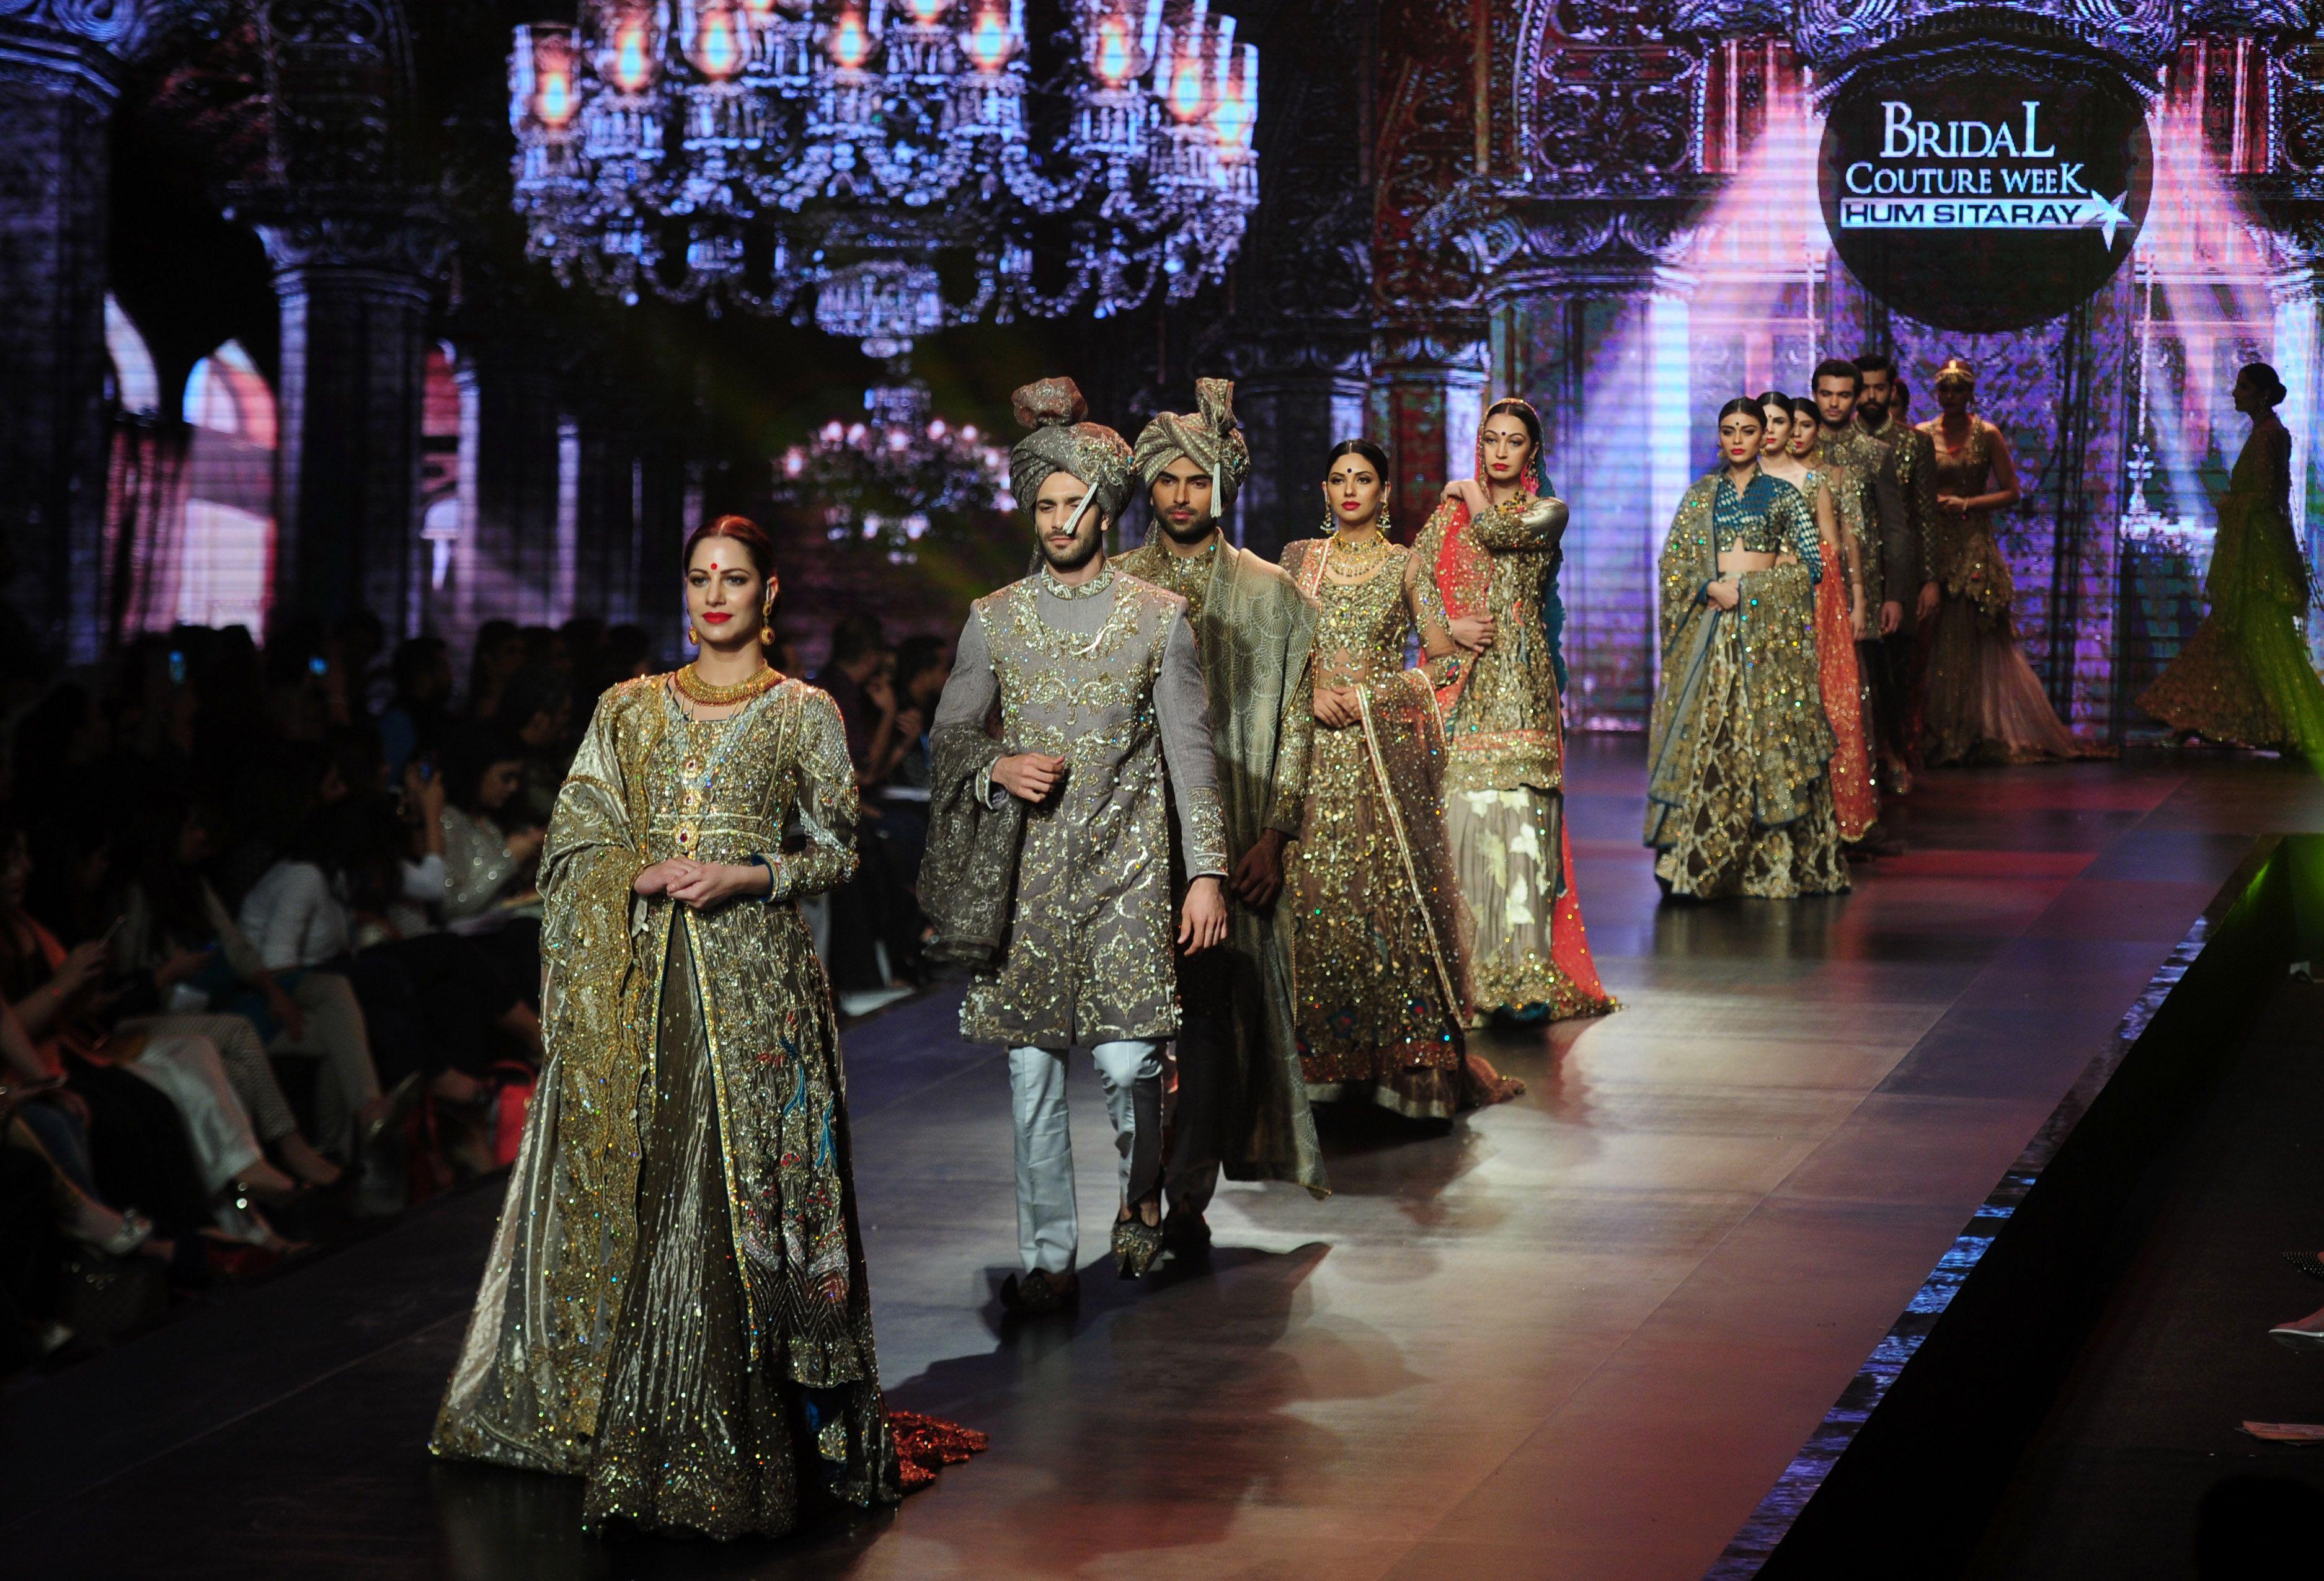 8bb86fa6e456c بالصور- انطلاق أسبوع فساتين الزفاف «الذهبية» في باكستان